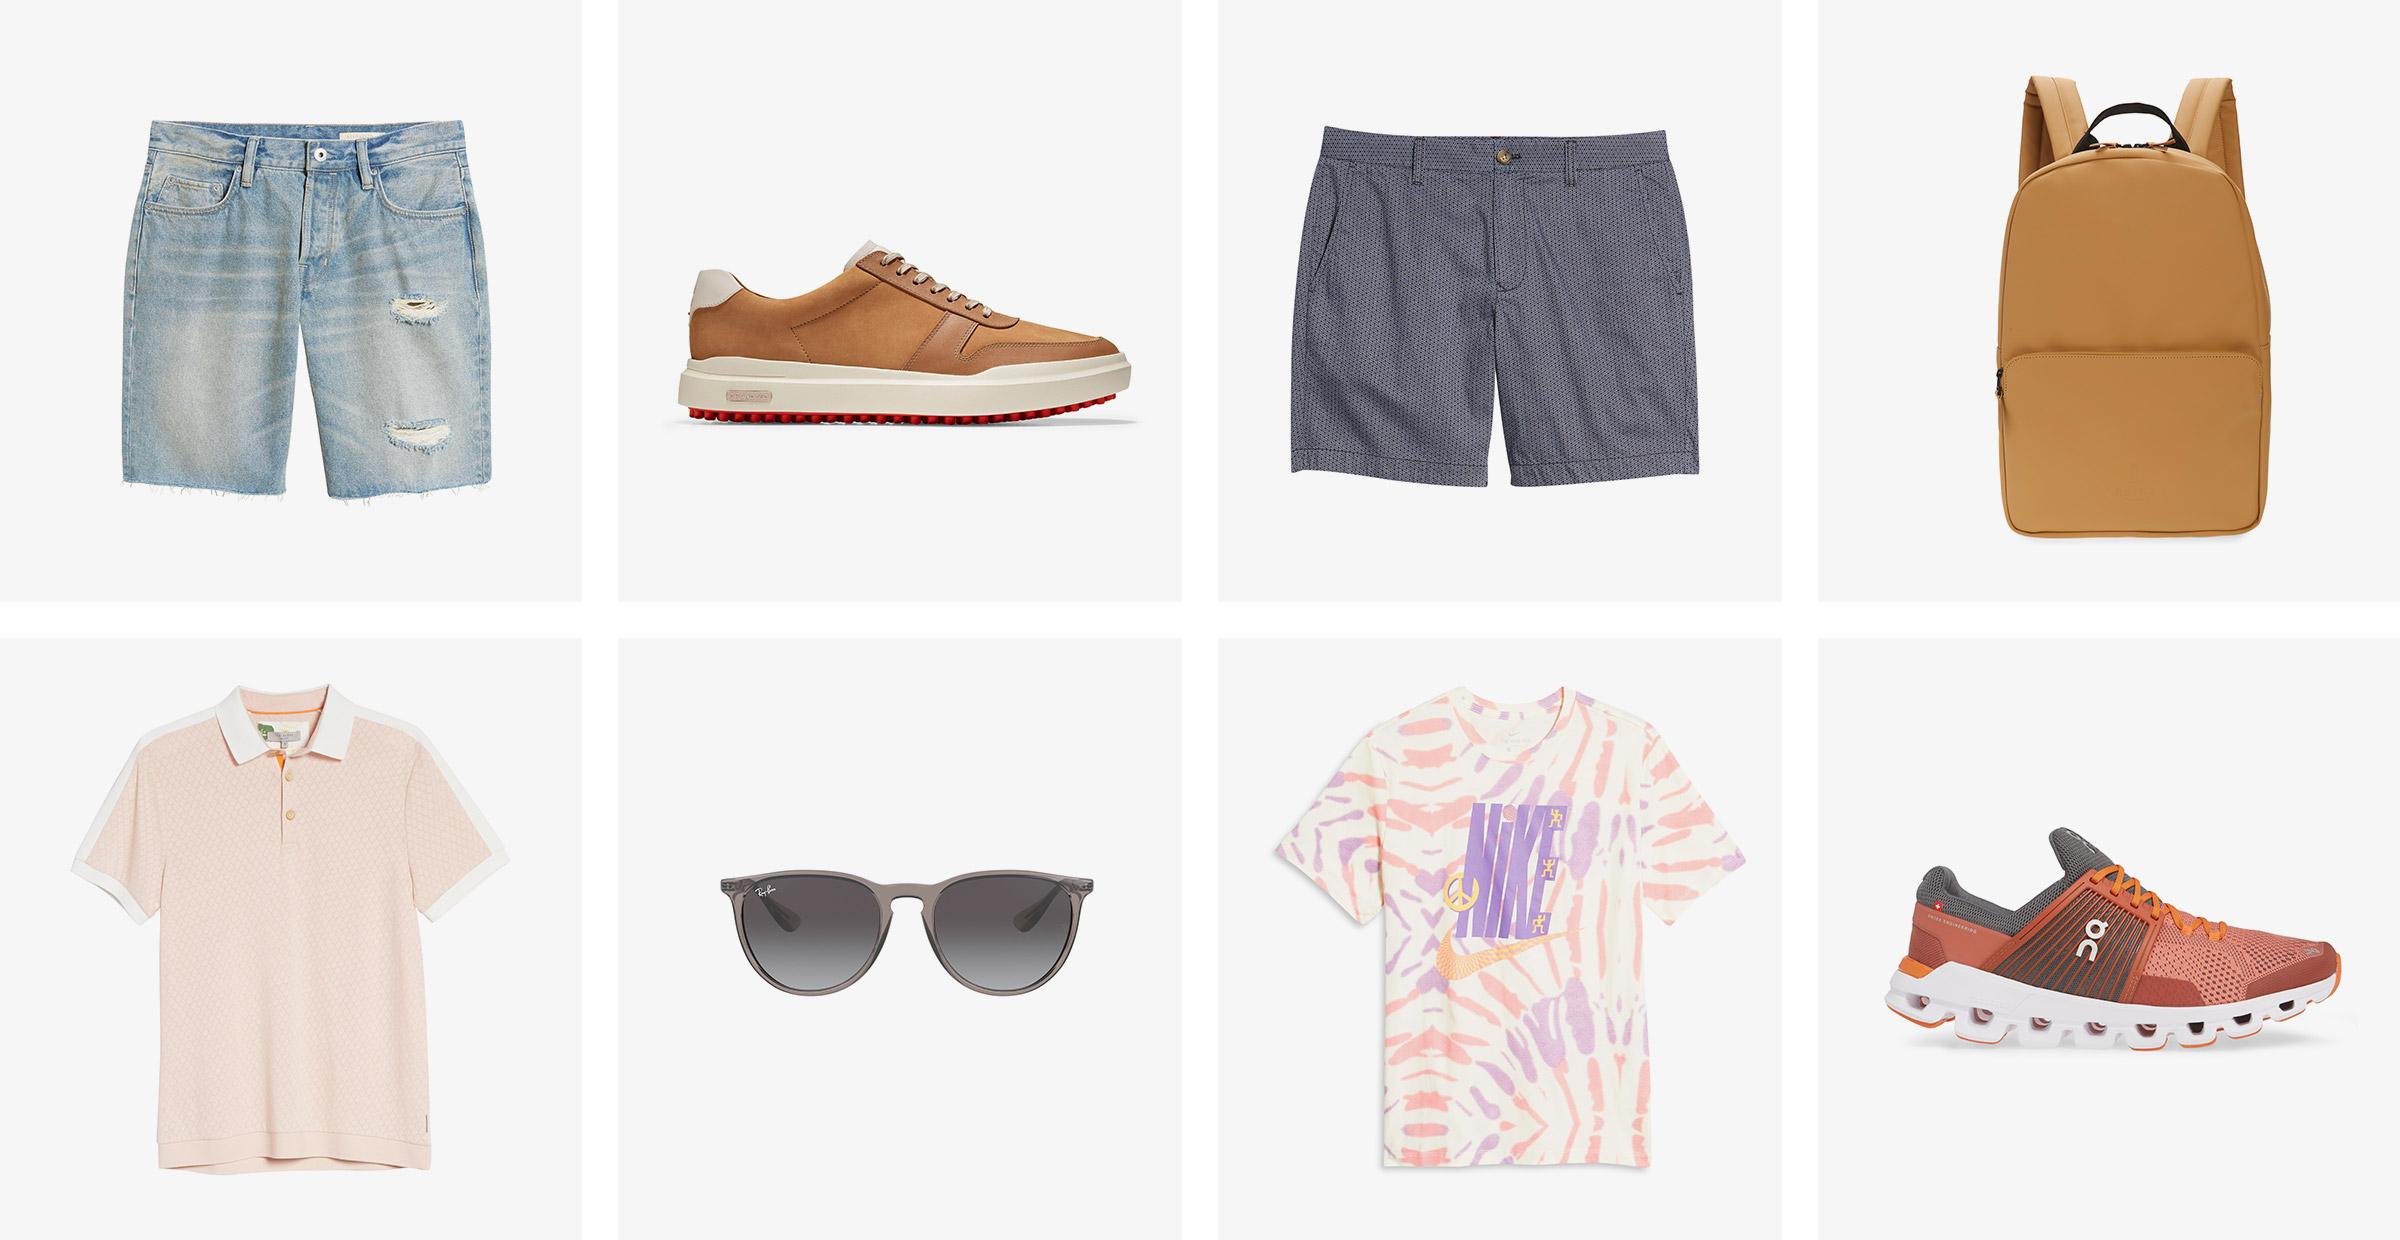 4 Ways to Wear Shorts